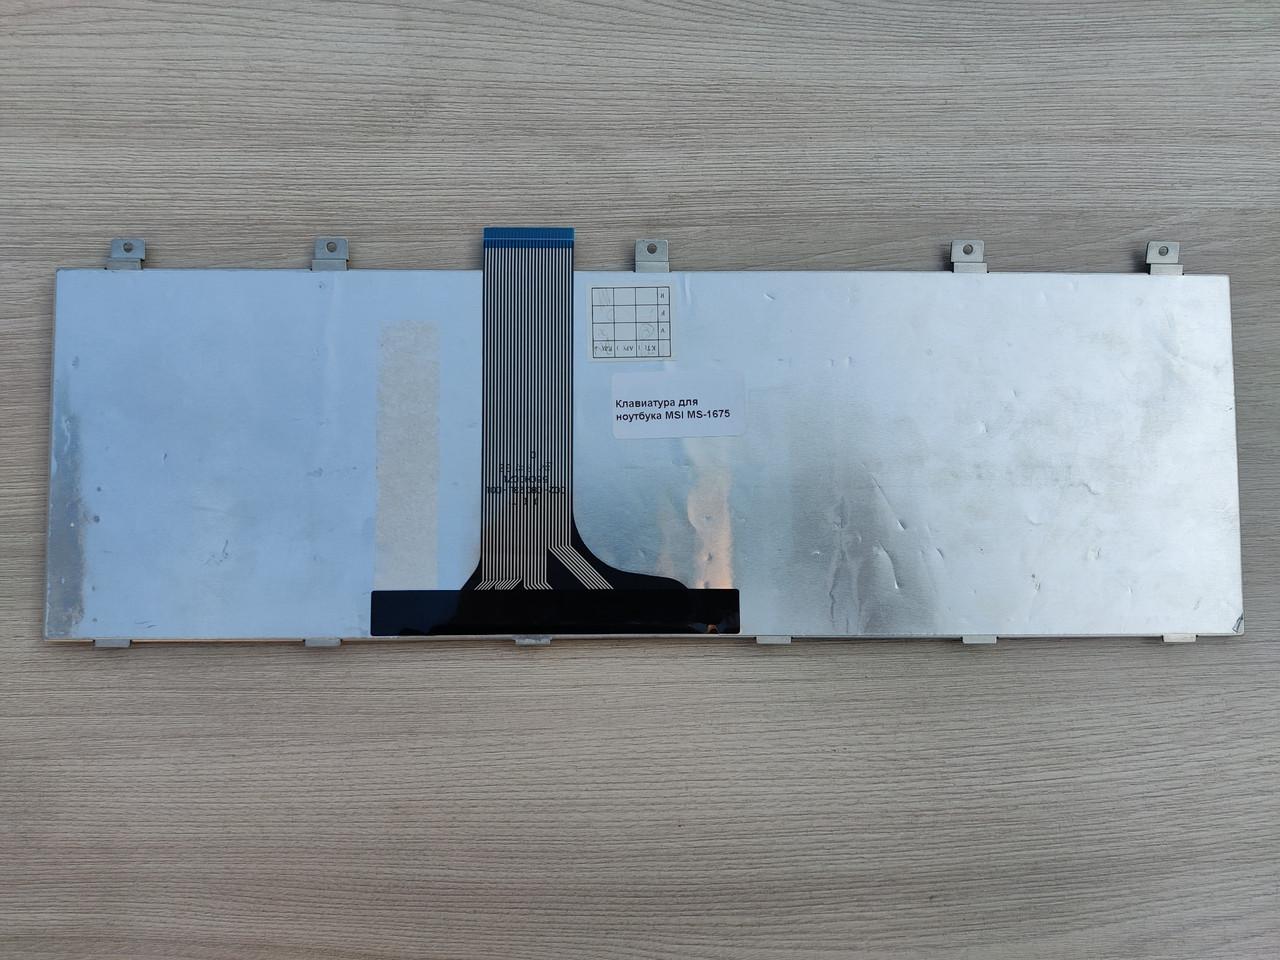 Клавиатура для ноутбука MSI ms-1675 - фото 2